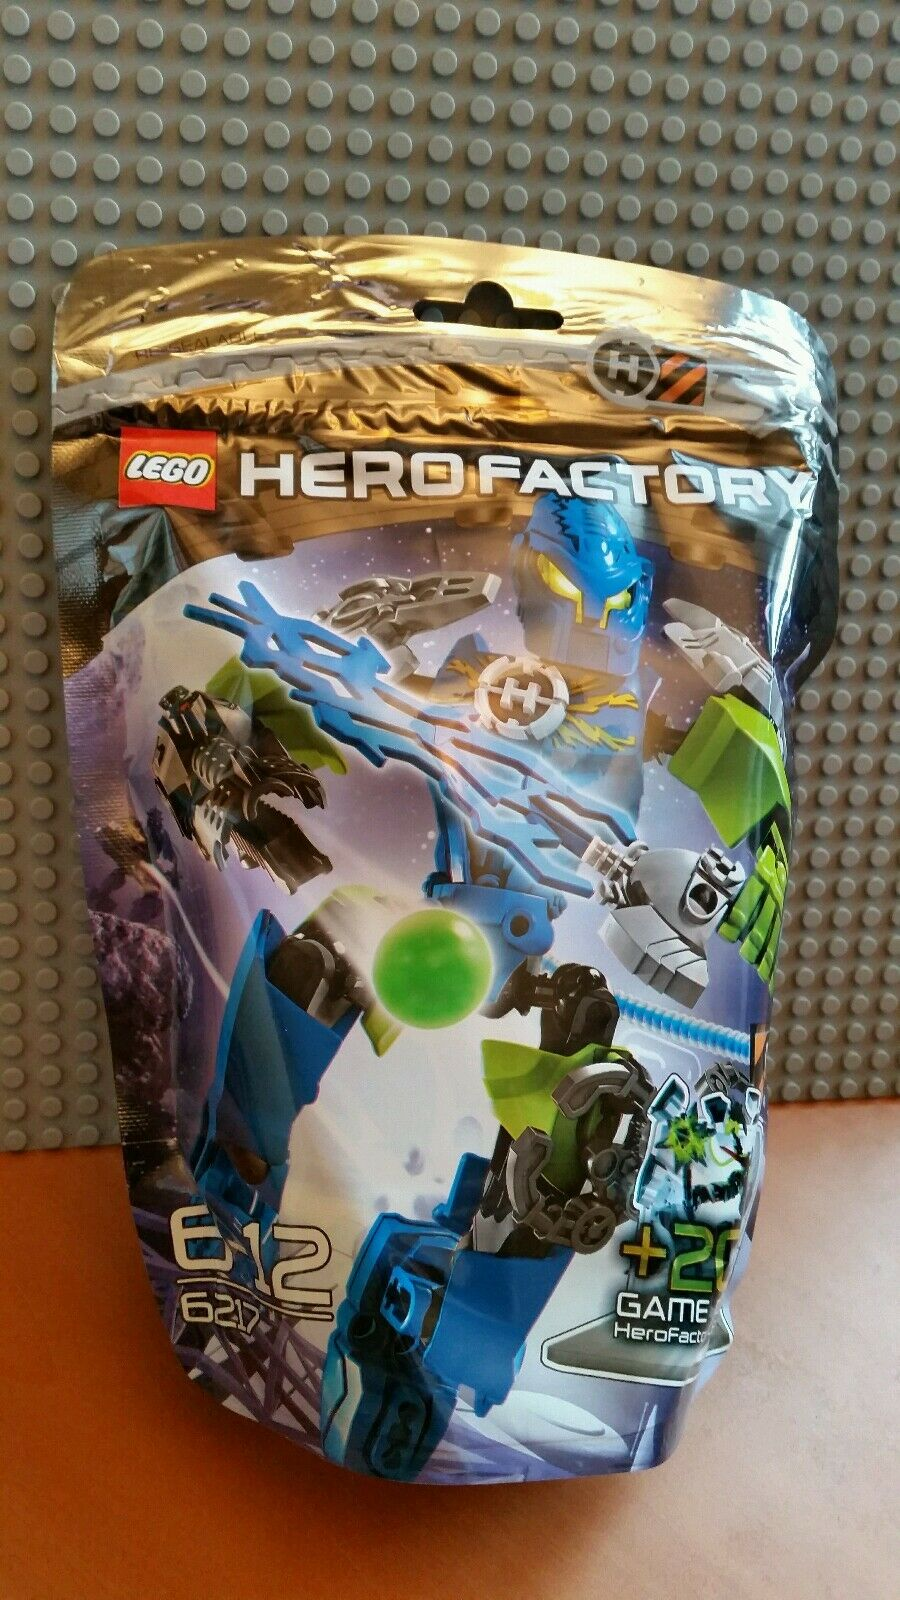 LEGO HERO FACTORY   6217 SURGE   RARE RETIRED   BNIP NEW✔SEALED✔ FAST P&P✔